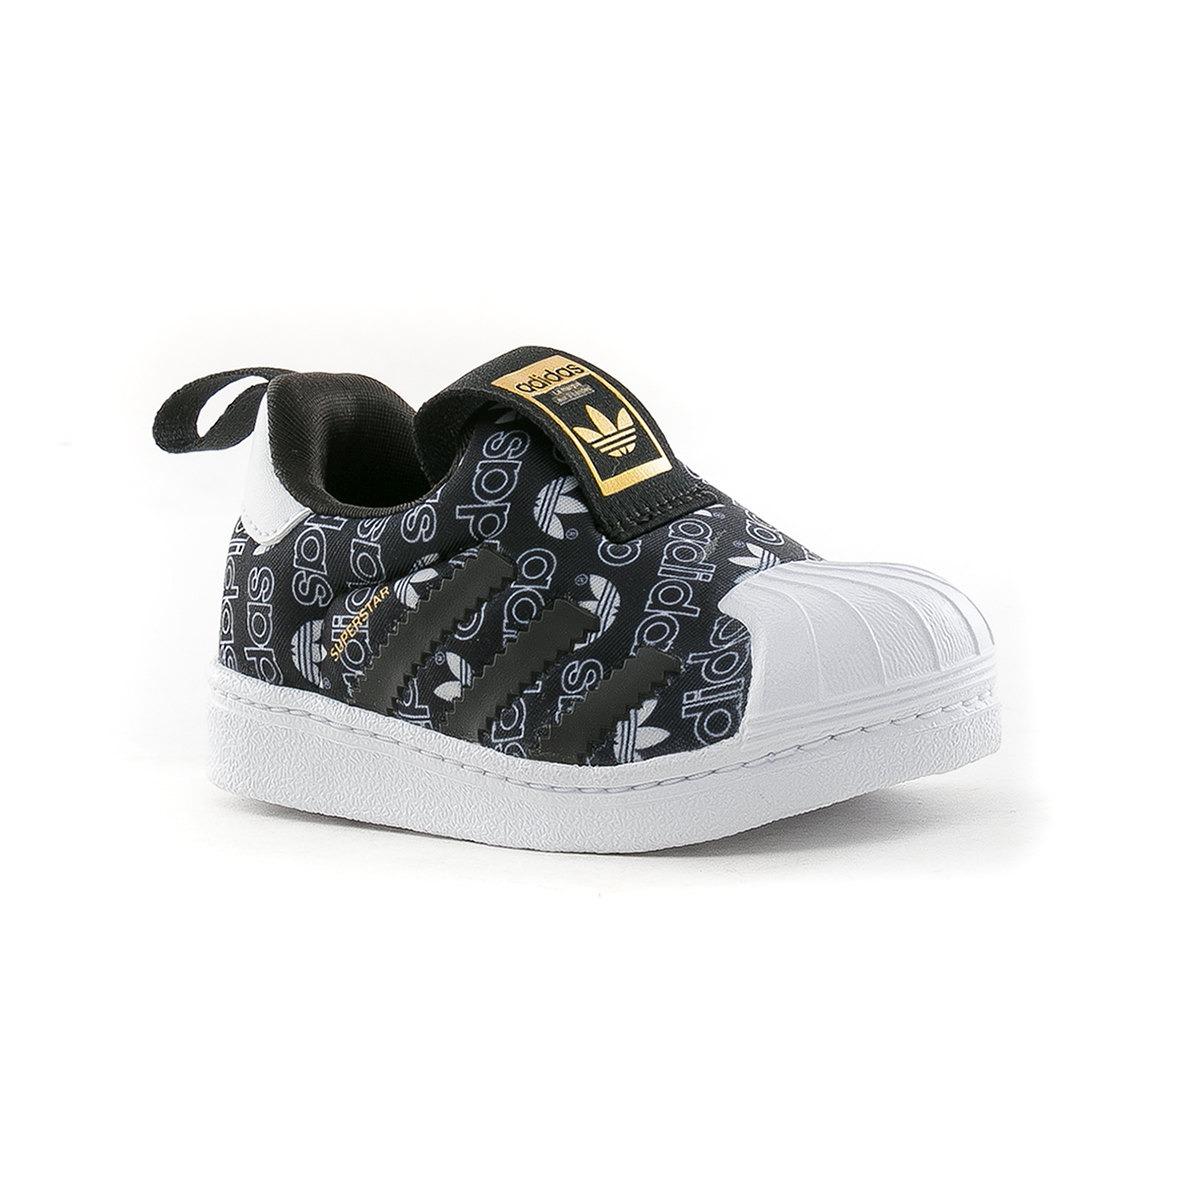 2a0d49f10 zapatillas superstar 360 i negro adidas originals. Cargando zoom.